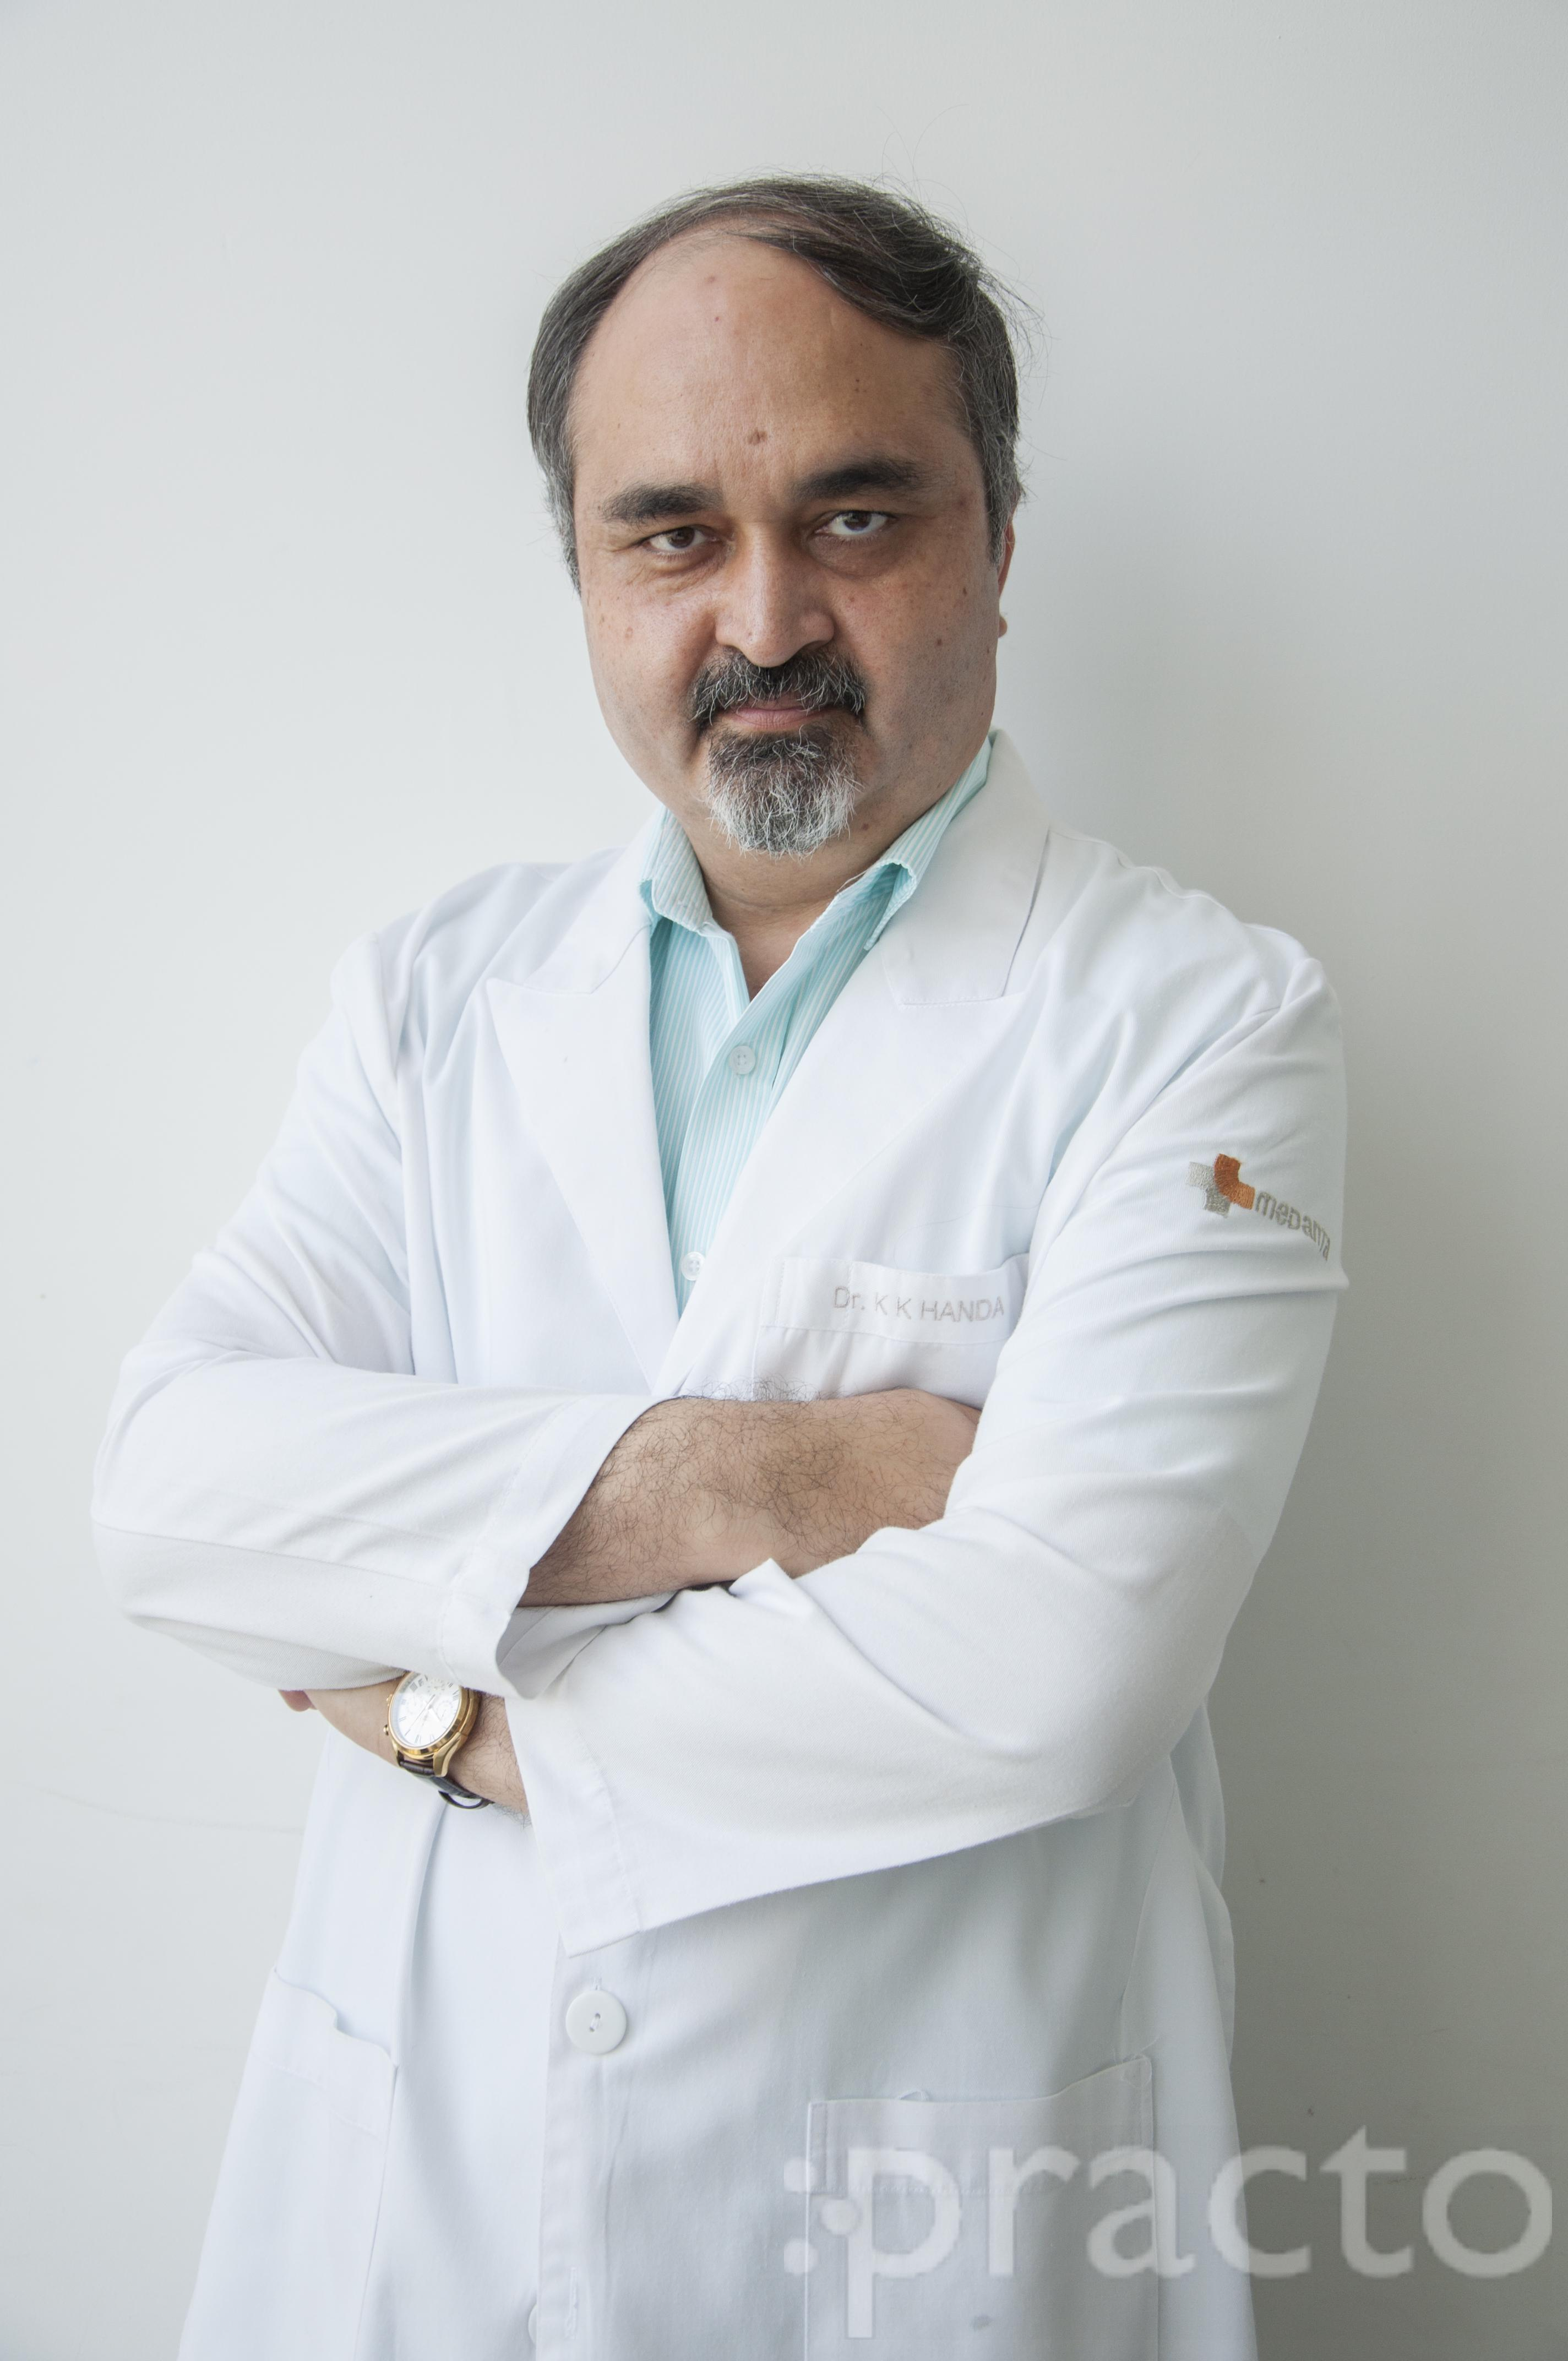 Dr. Kumud Handa - Ear-Nose-Throat (ENT) Specialist